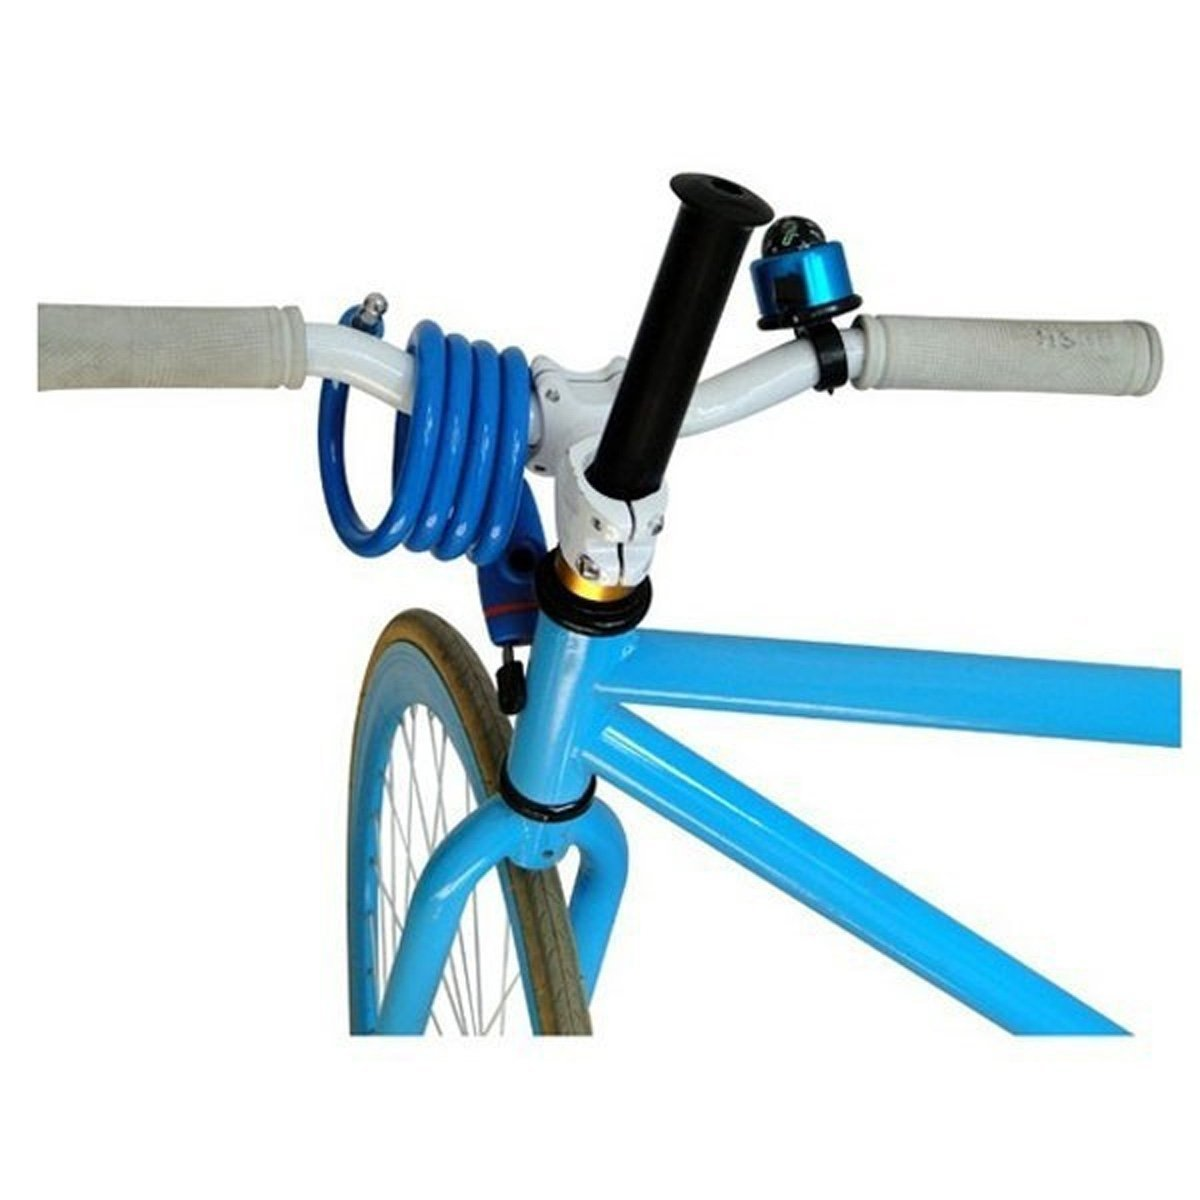 ATian Bicycle gps tracker TK305 GPS/GSM/GPRS Quad Band Real-time Google Map tracker gps 305 Mini Hidden Bike Tracker TK305